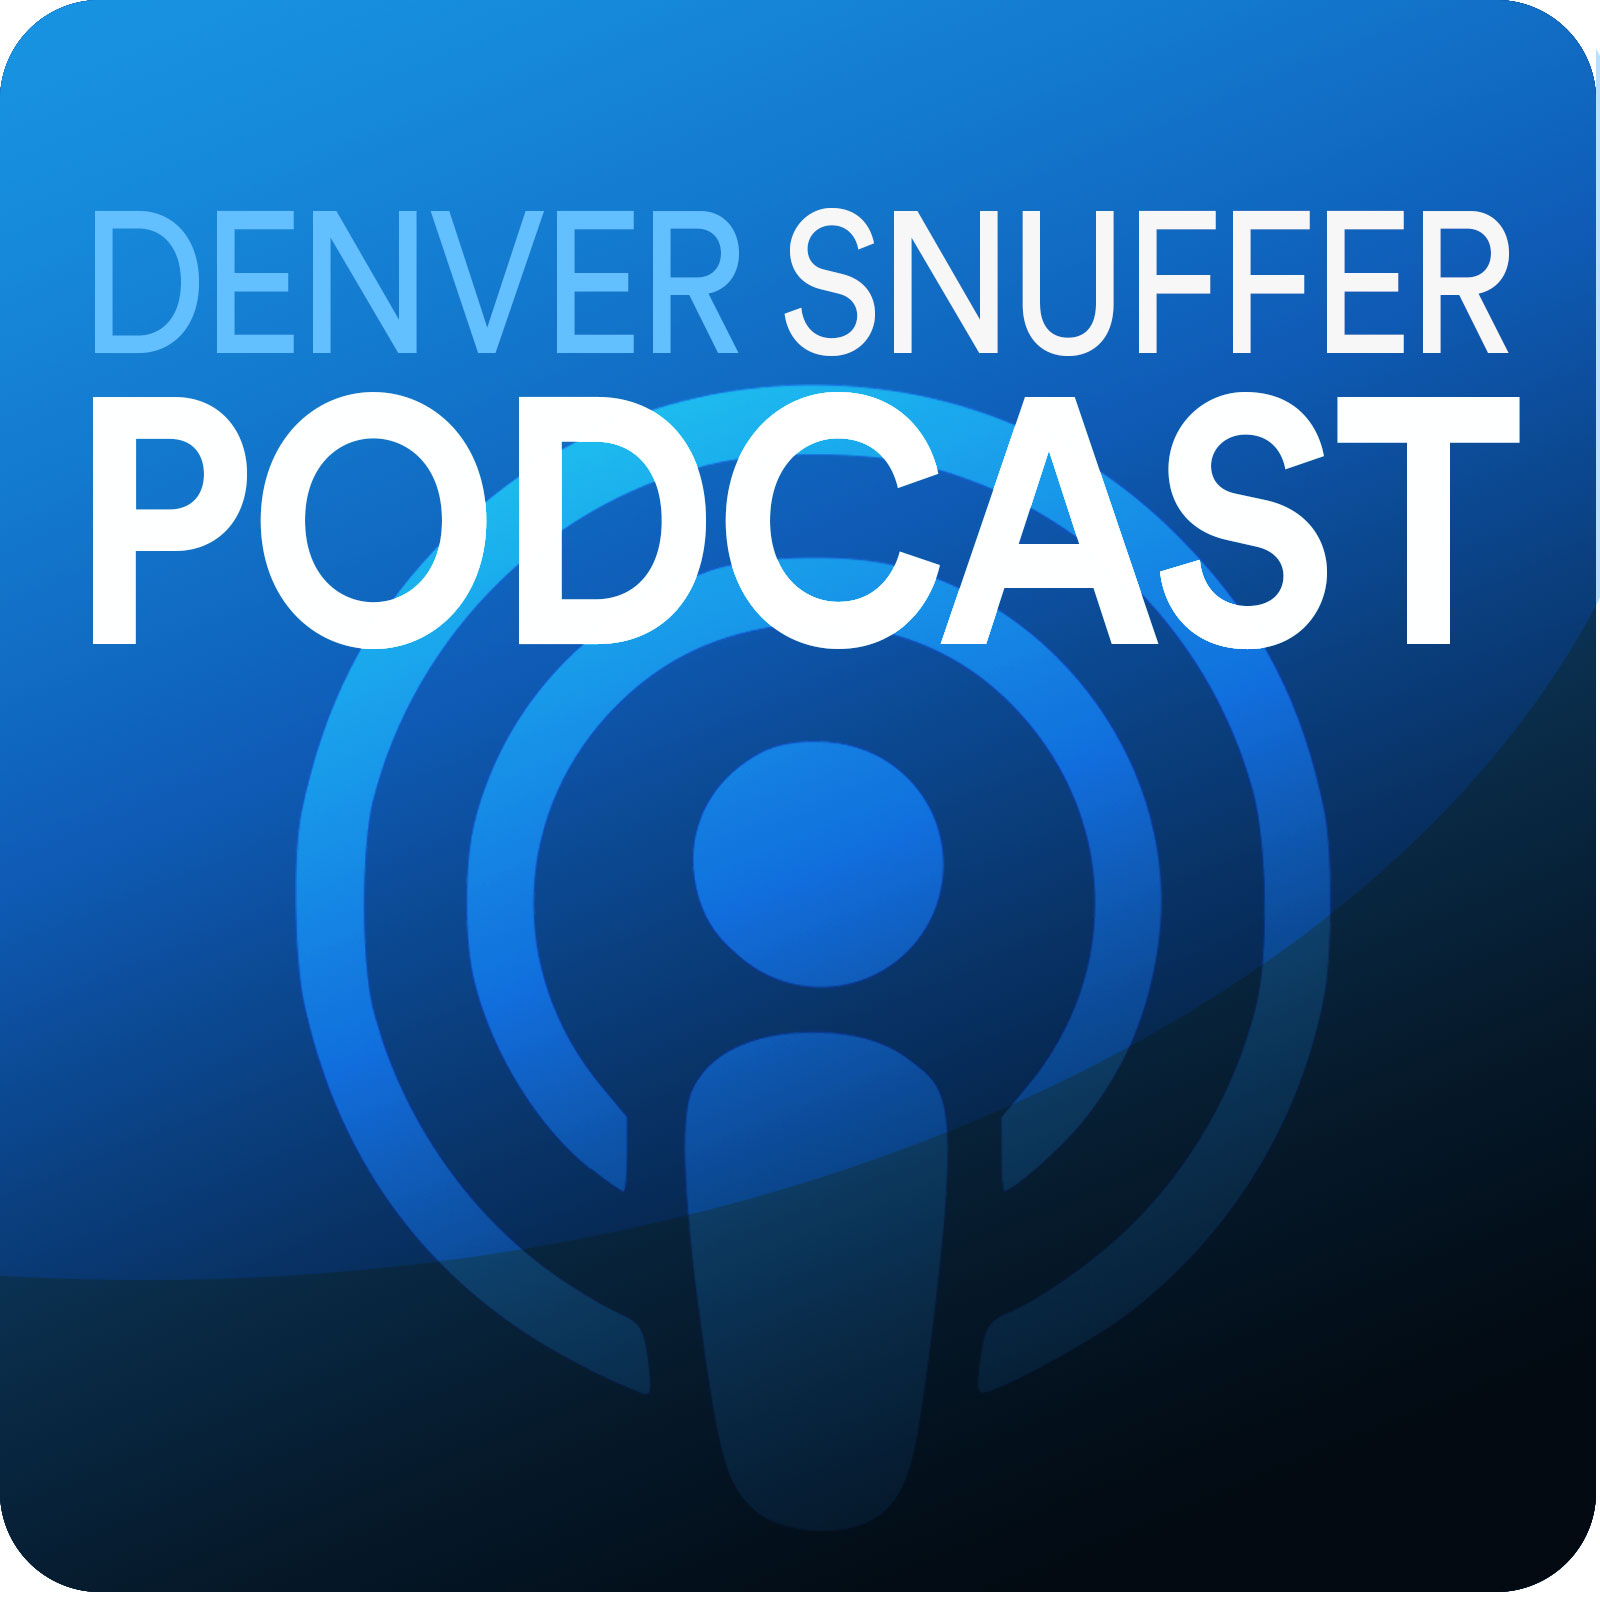 Denver Snuffer Podcast